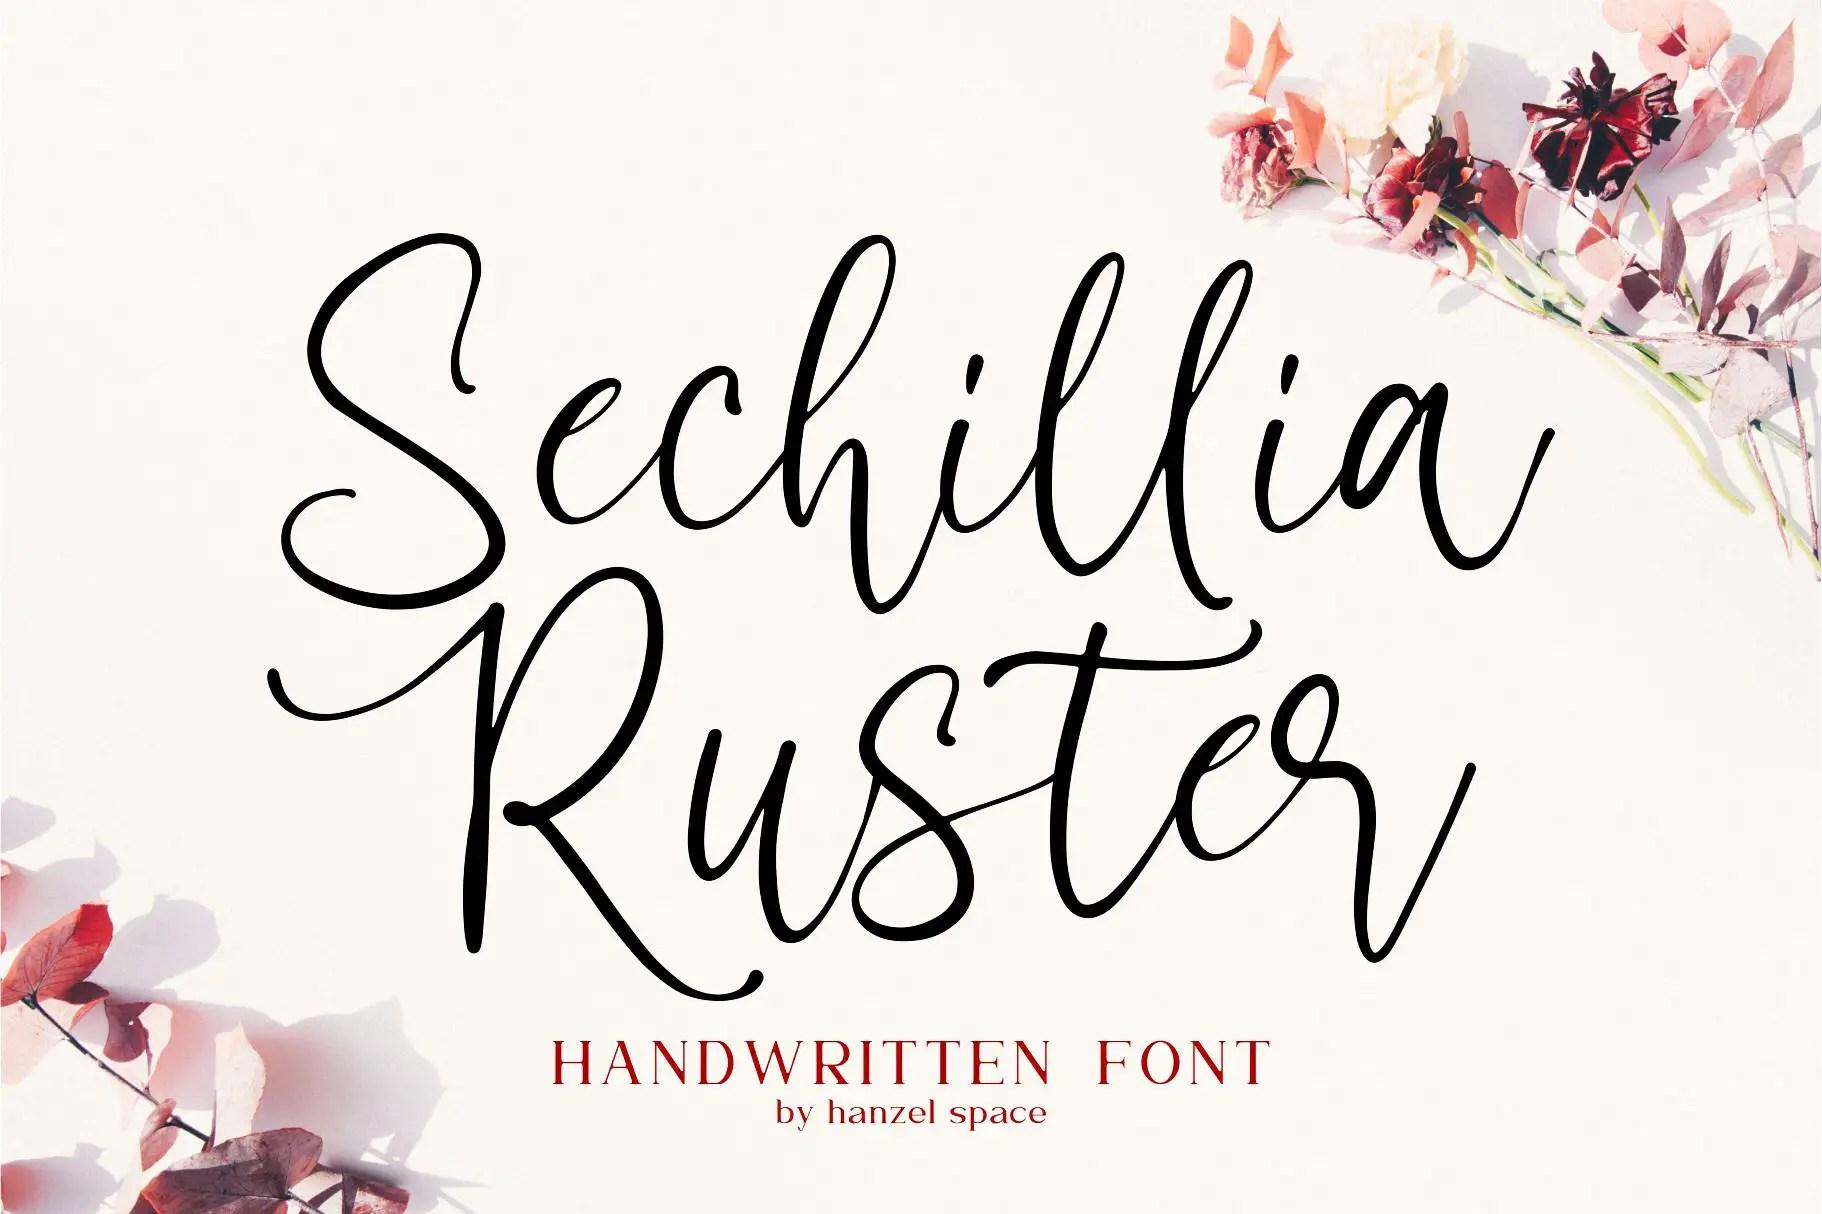 Sechillia Ruster Handwritten Script Font-1